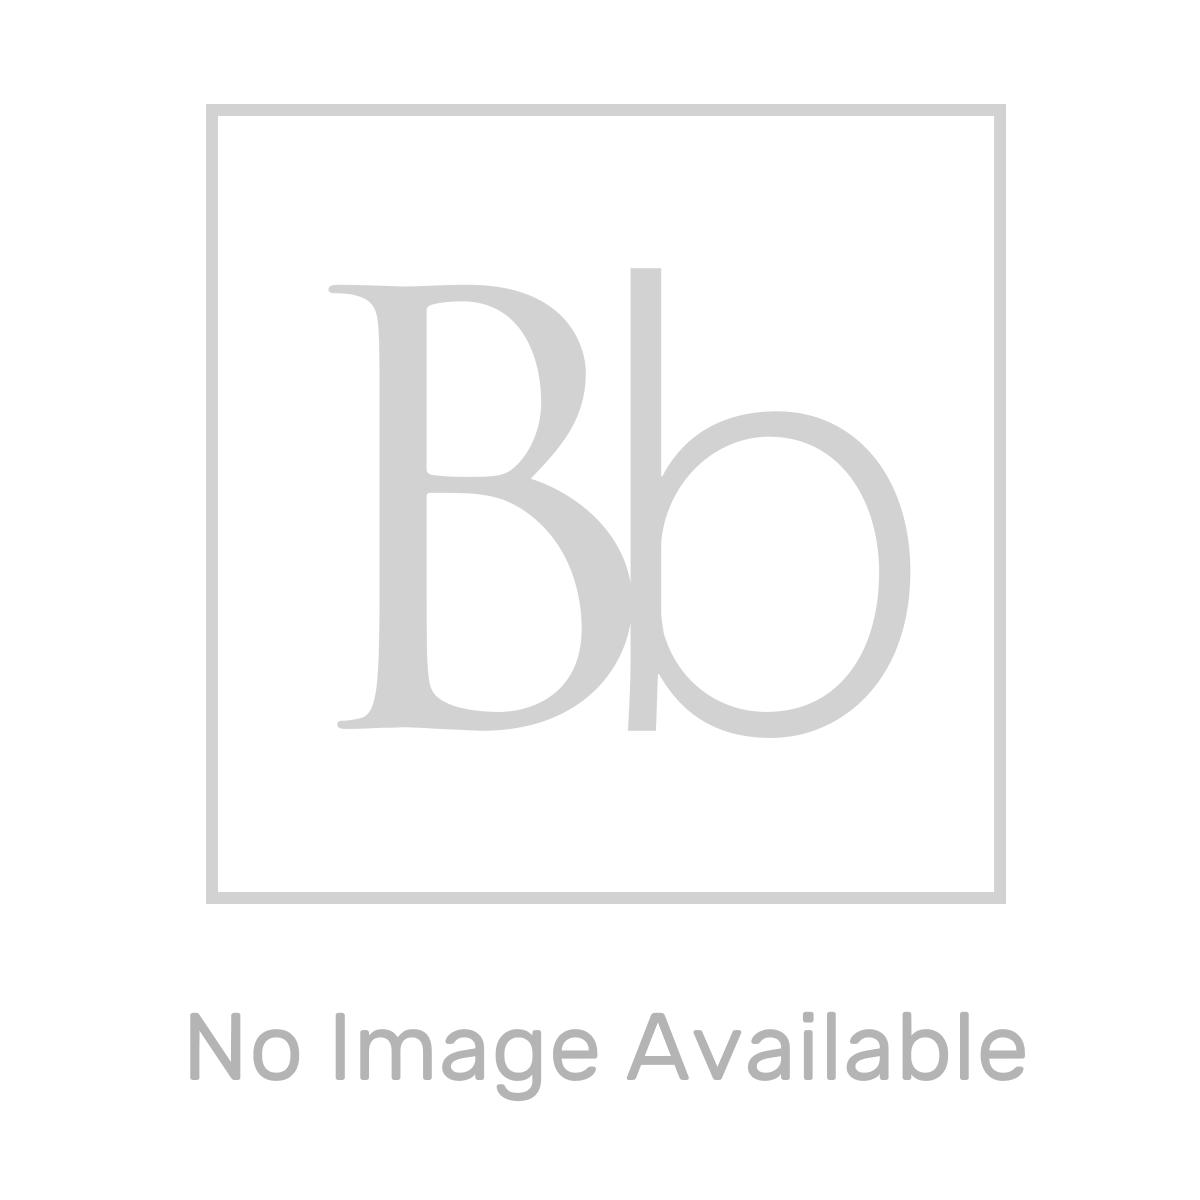 April Rectangular Anti Slip Shower Tray 1200 x 800 Line Drawing